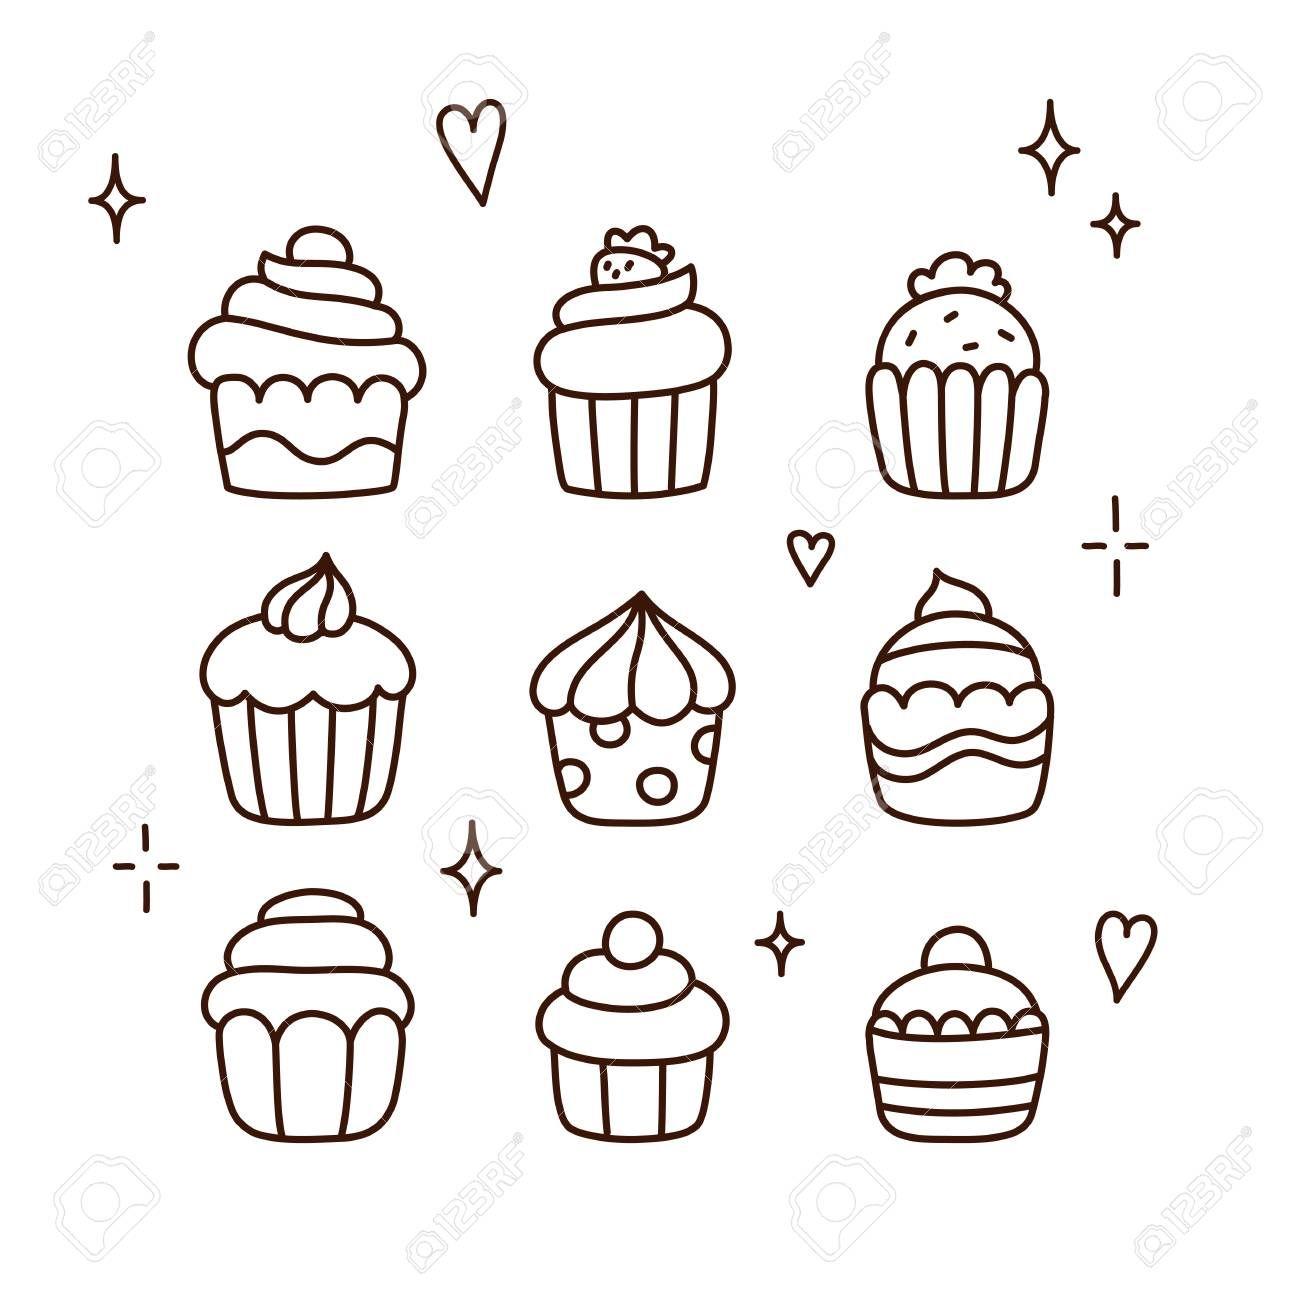 Set Of Cute Cartoon Cupcake Doodles Hand Drawn Line Art Cartoon Cupcakes Cupcake Drawing Cupcake Illustration